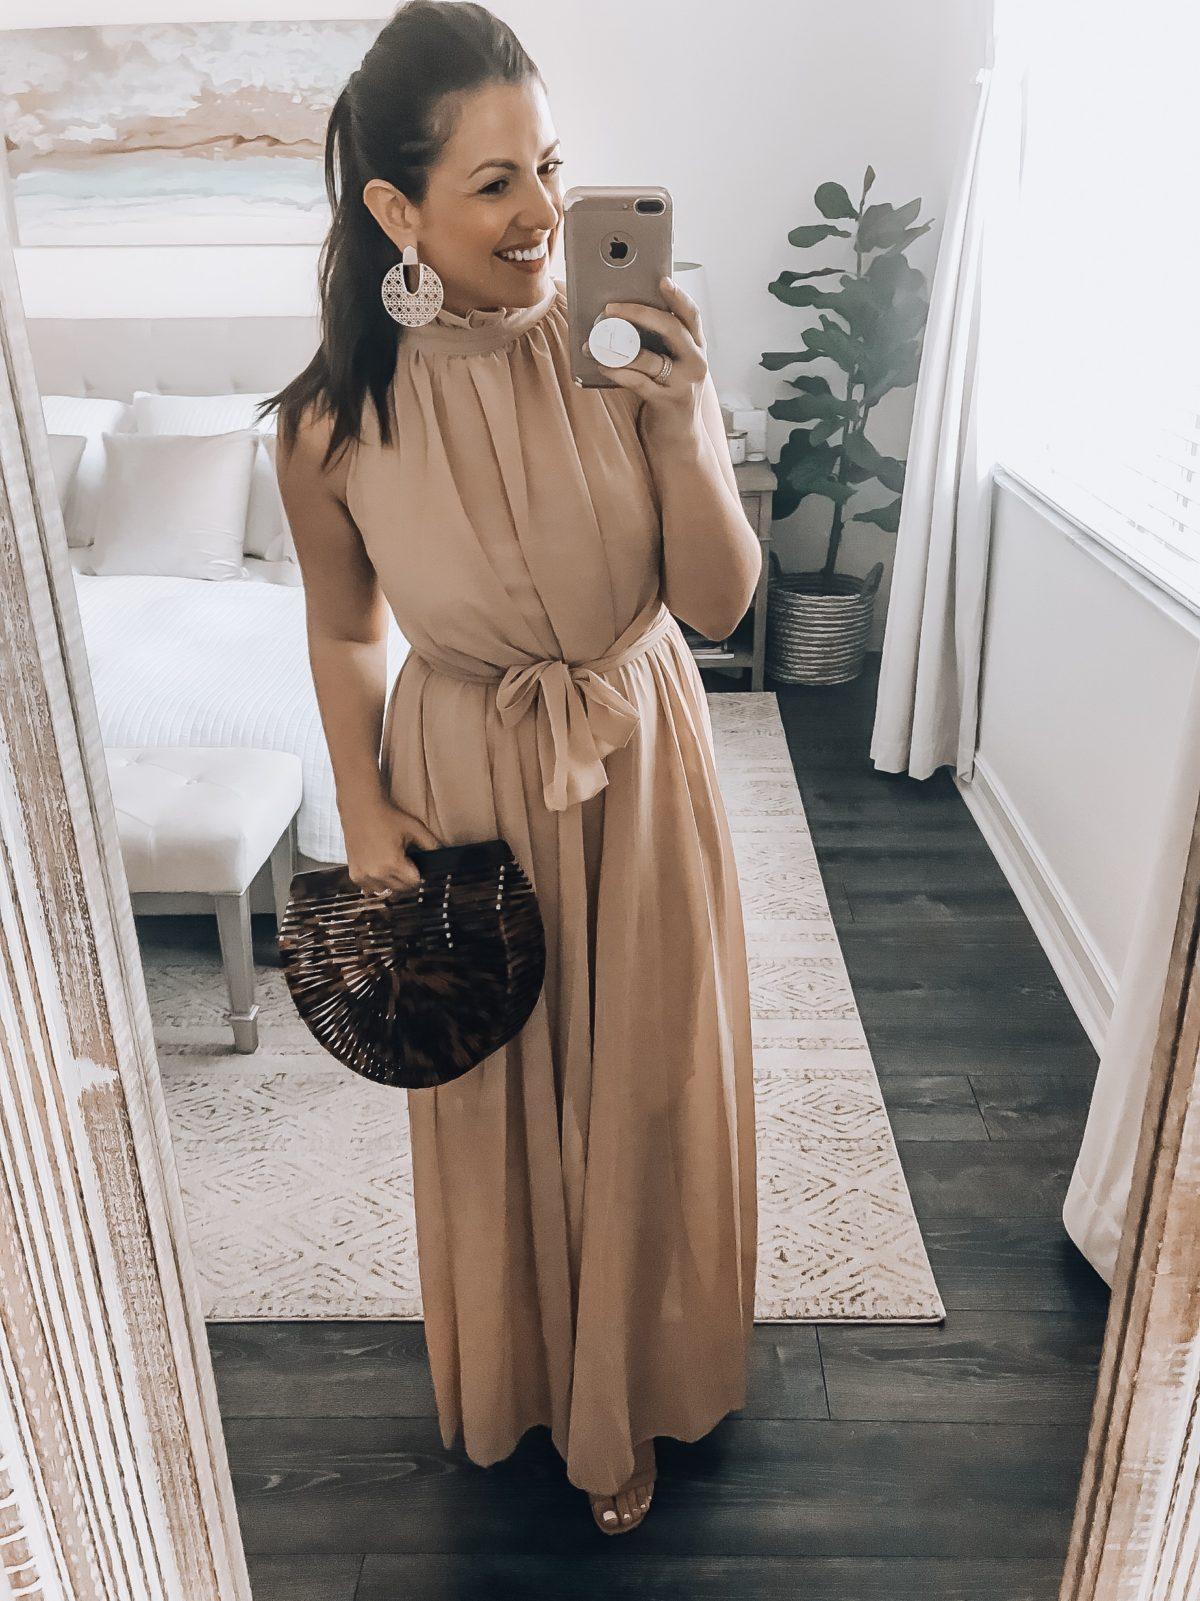 Amazon Fashion Haul wedding guest dress, chiffon maxi dress